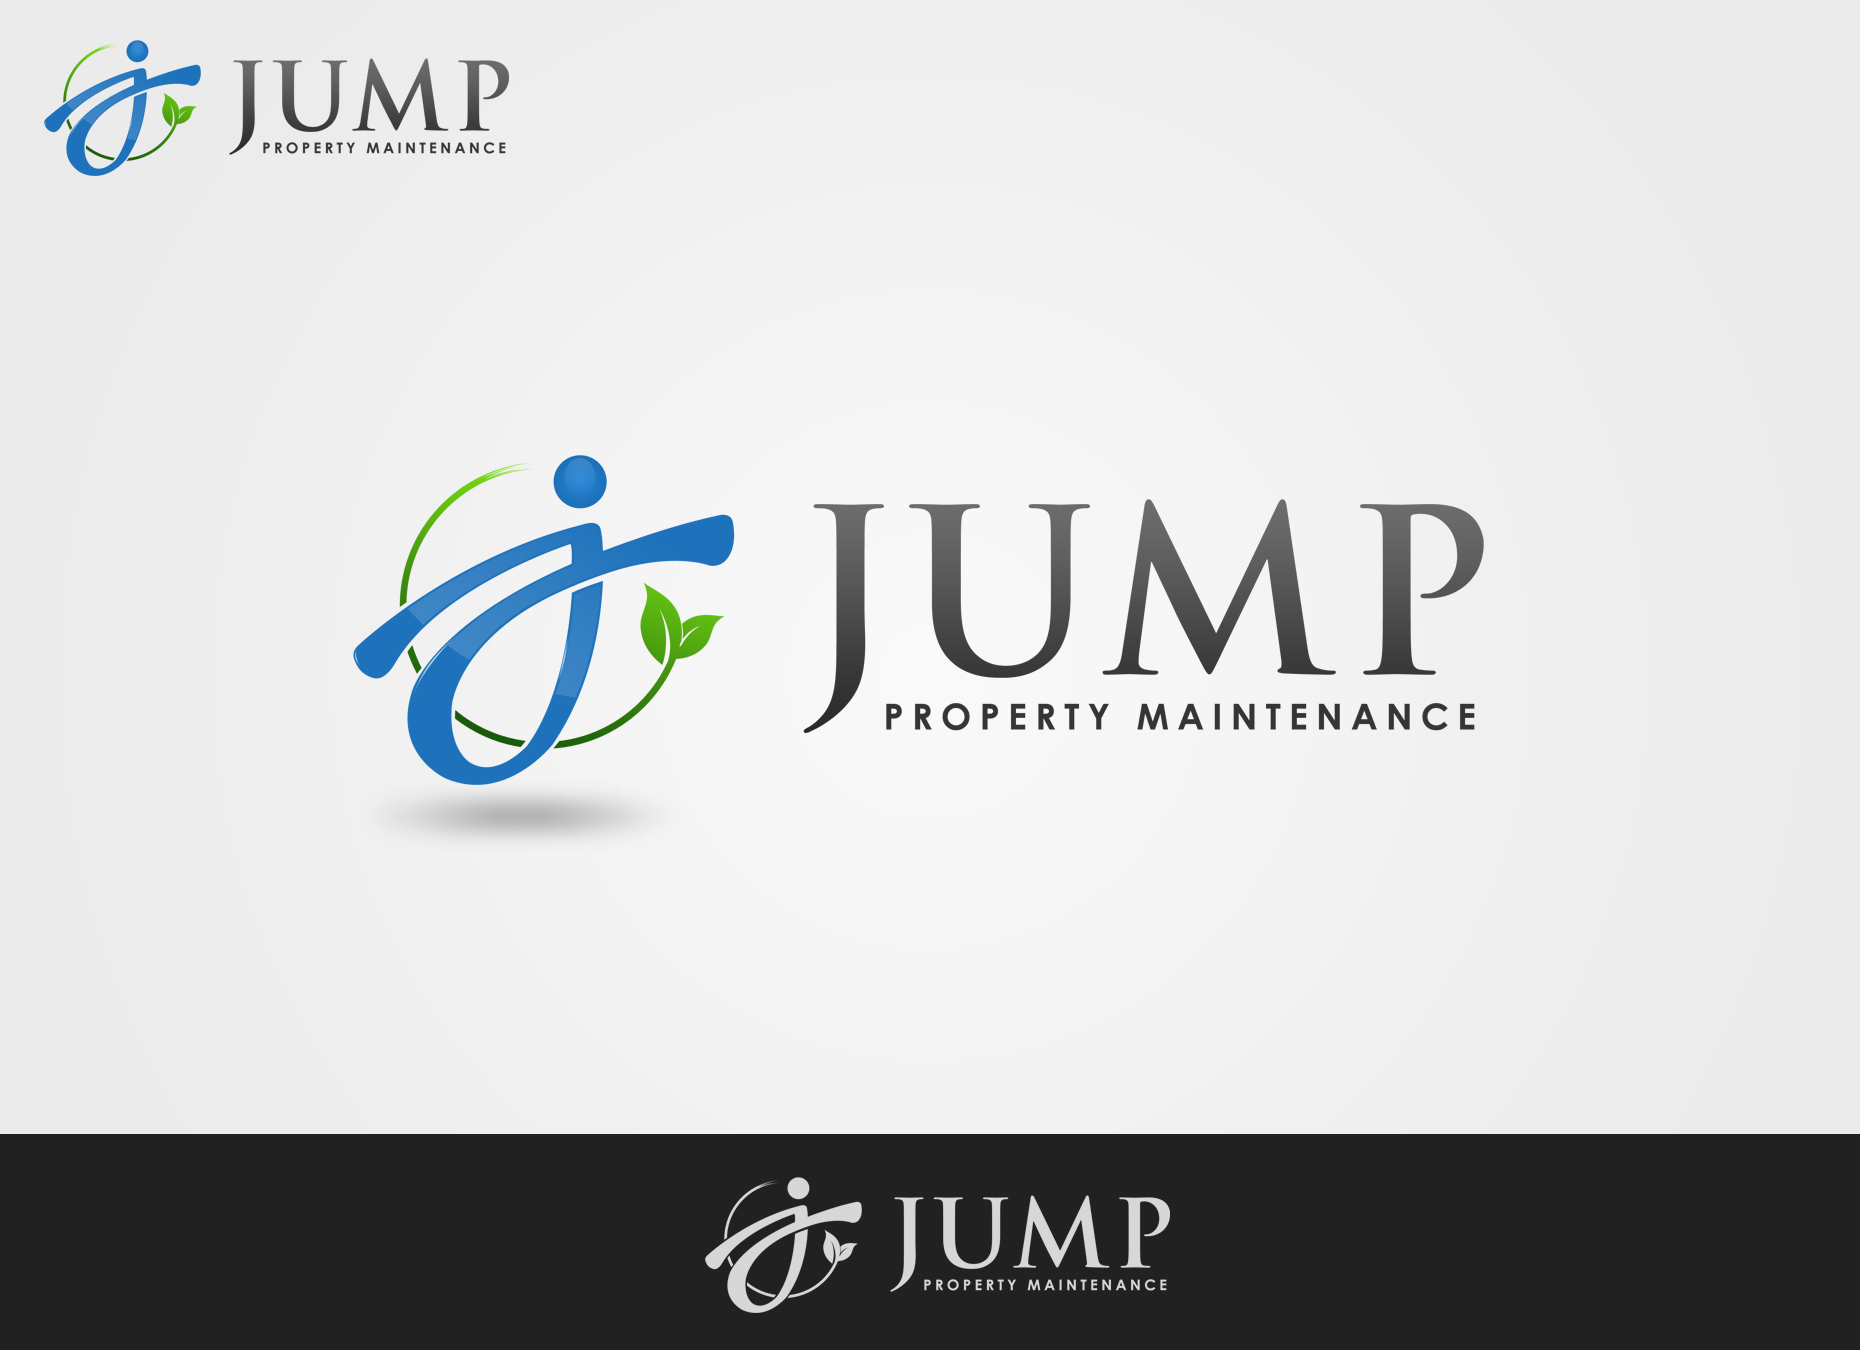 Logo Design by omARTist - Entry No. 104 in the Logo Design Contest Creative Logo Design for Jump Property Maintenance.